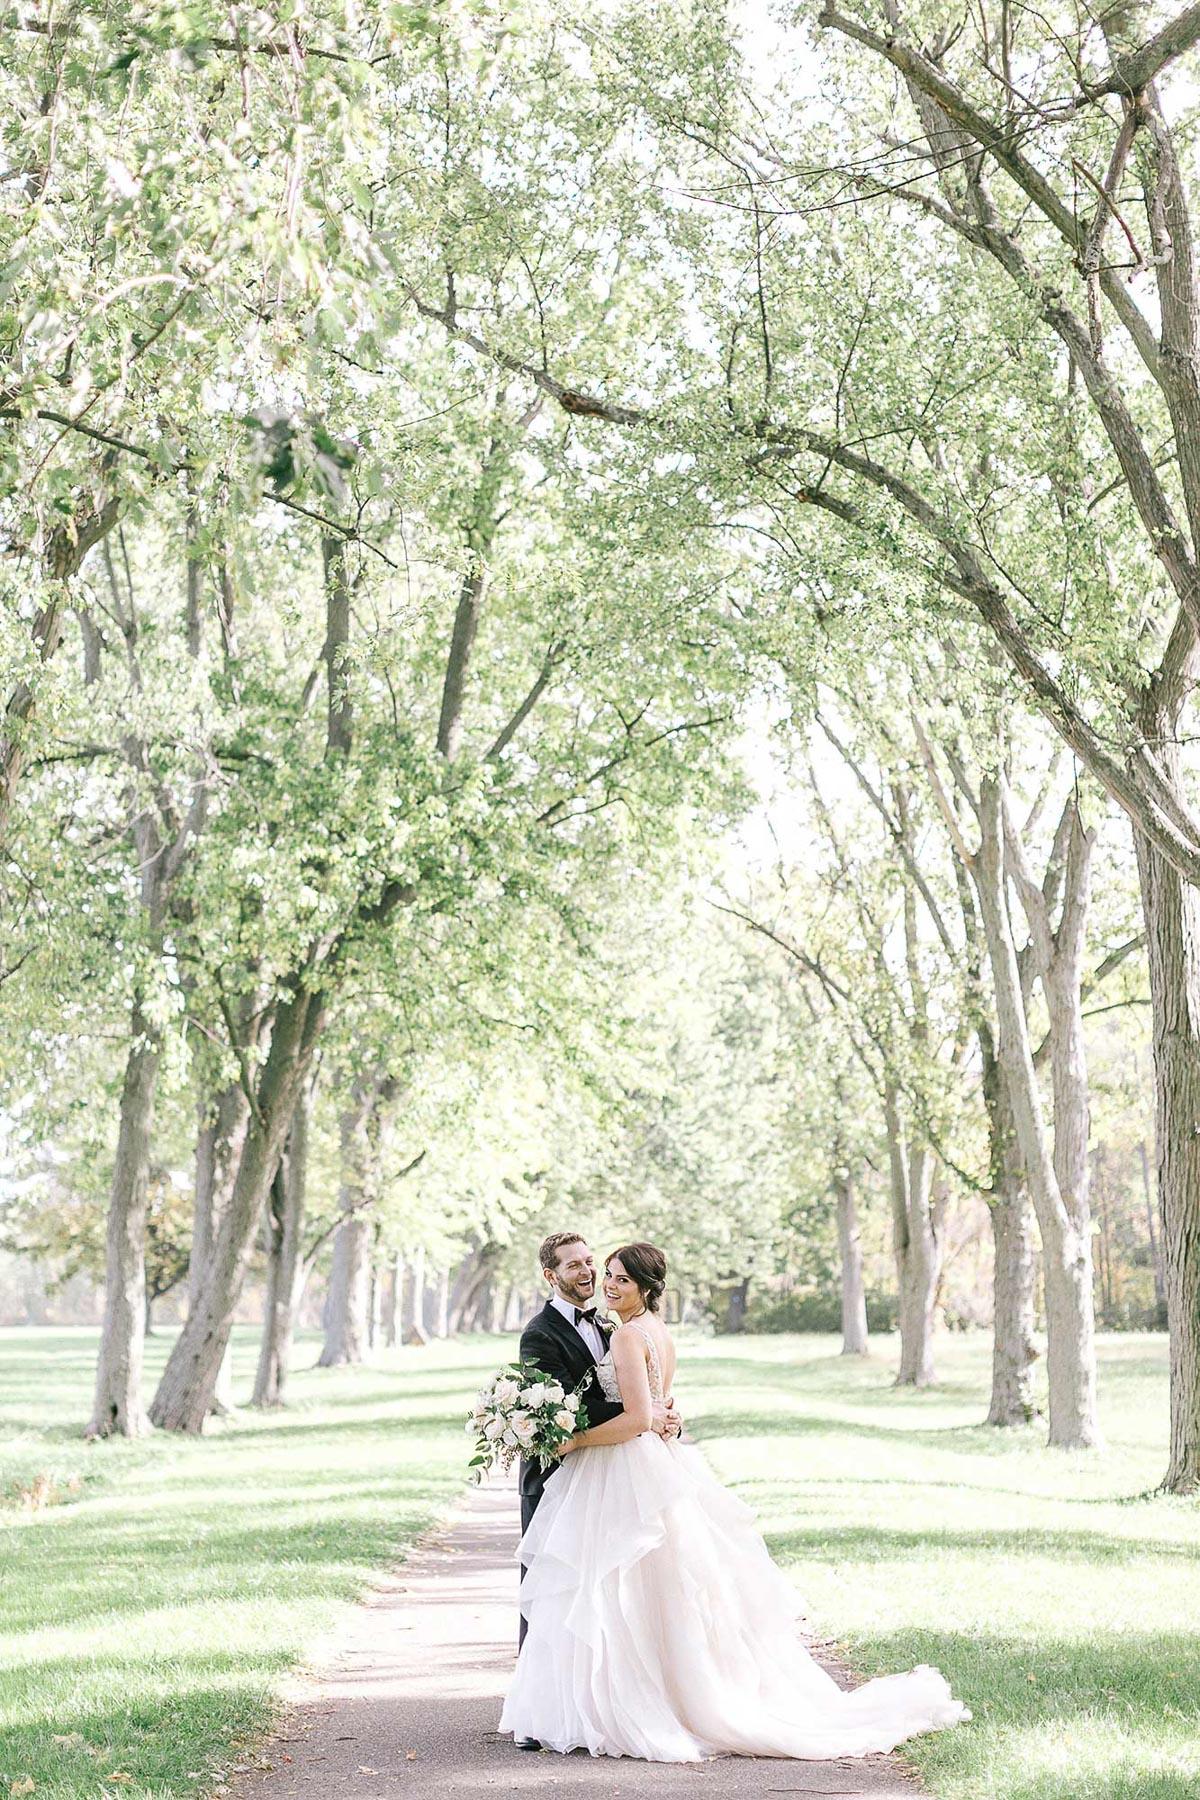 tamara-lockwood-photography-vineyard-bride-swish-list-the-old-courthouse-niagara-on-the-lake-wedding-78.jpg